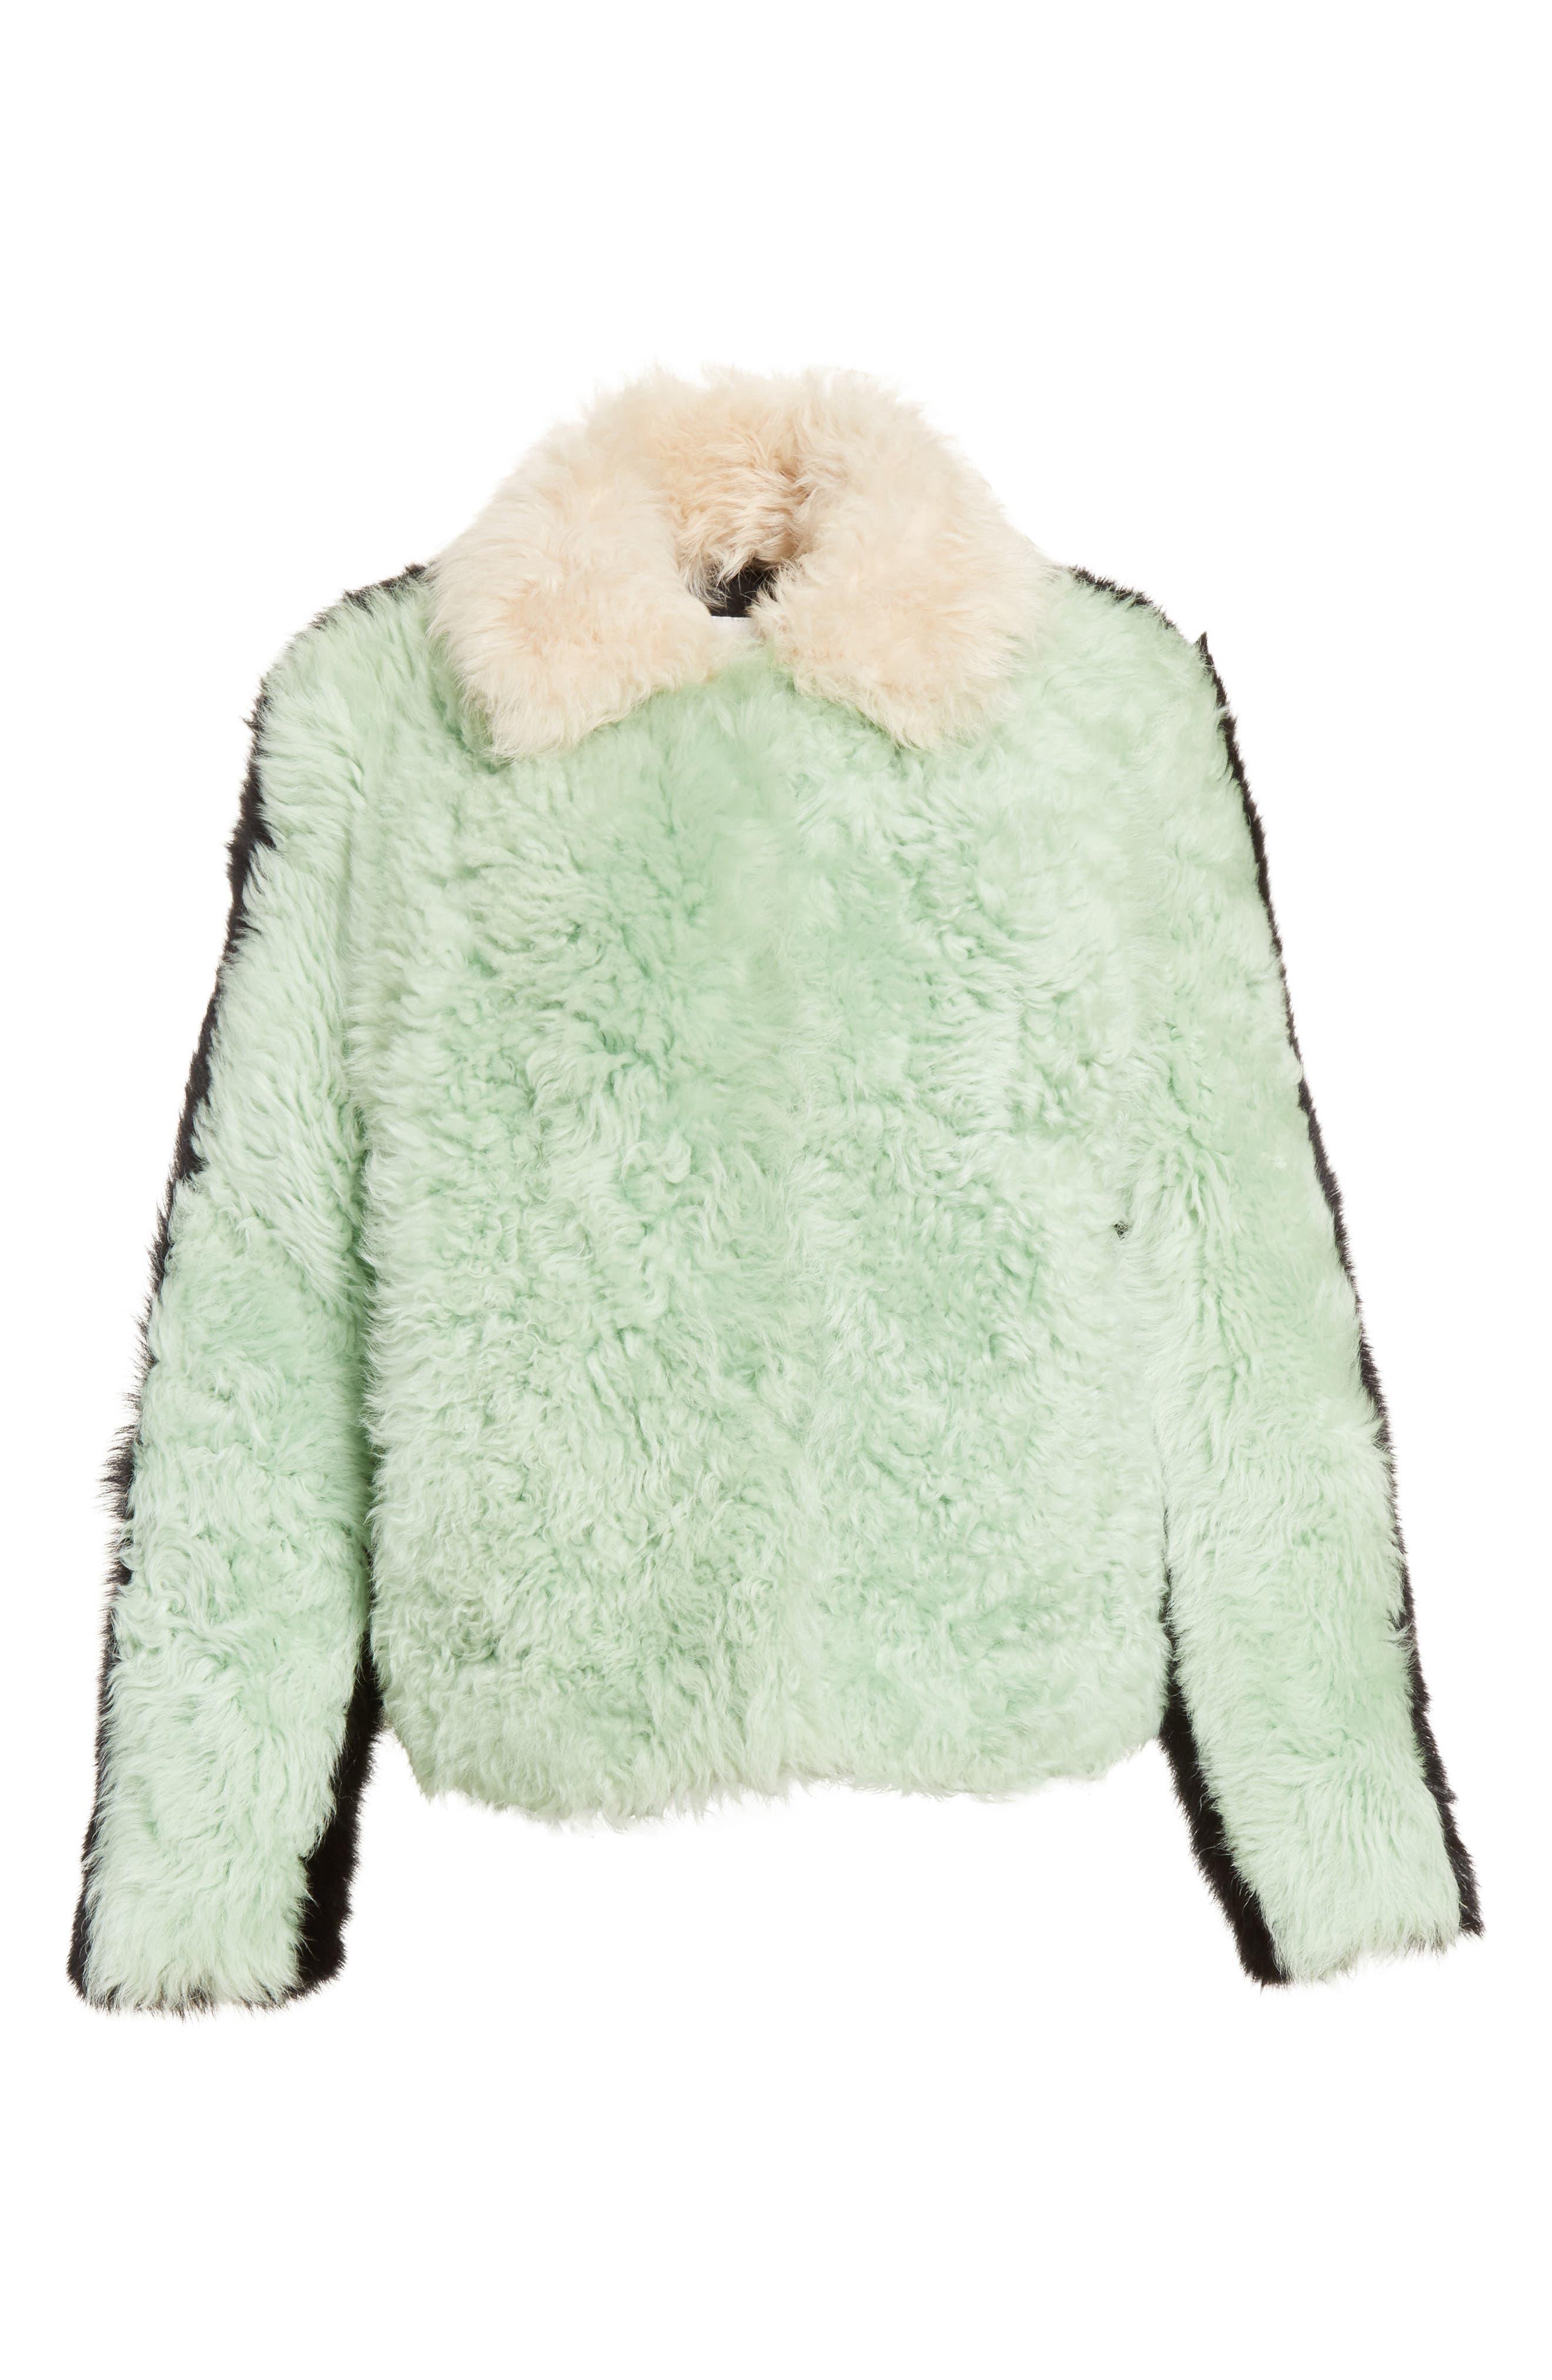 Cashew Genuine Shearling Coat,                             Alternate thumbnail 2, color,